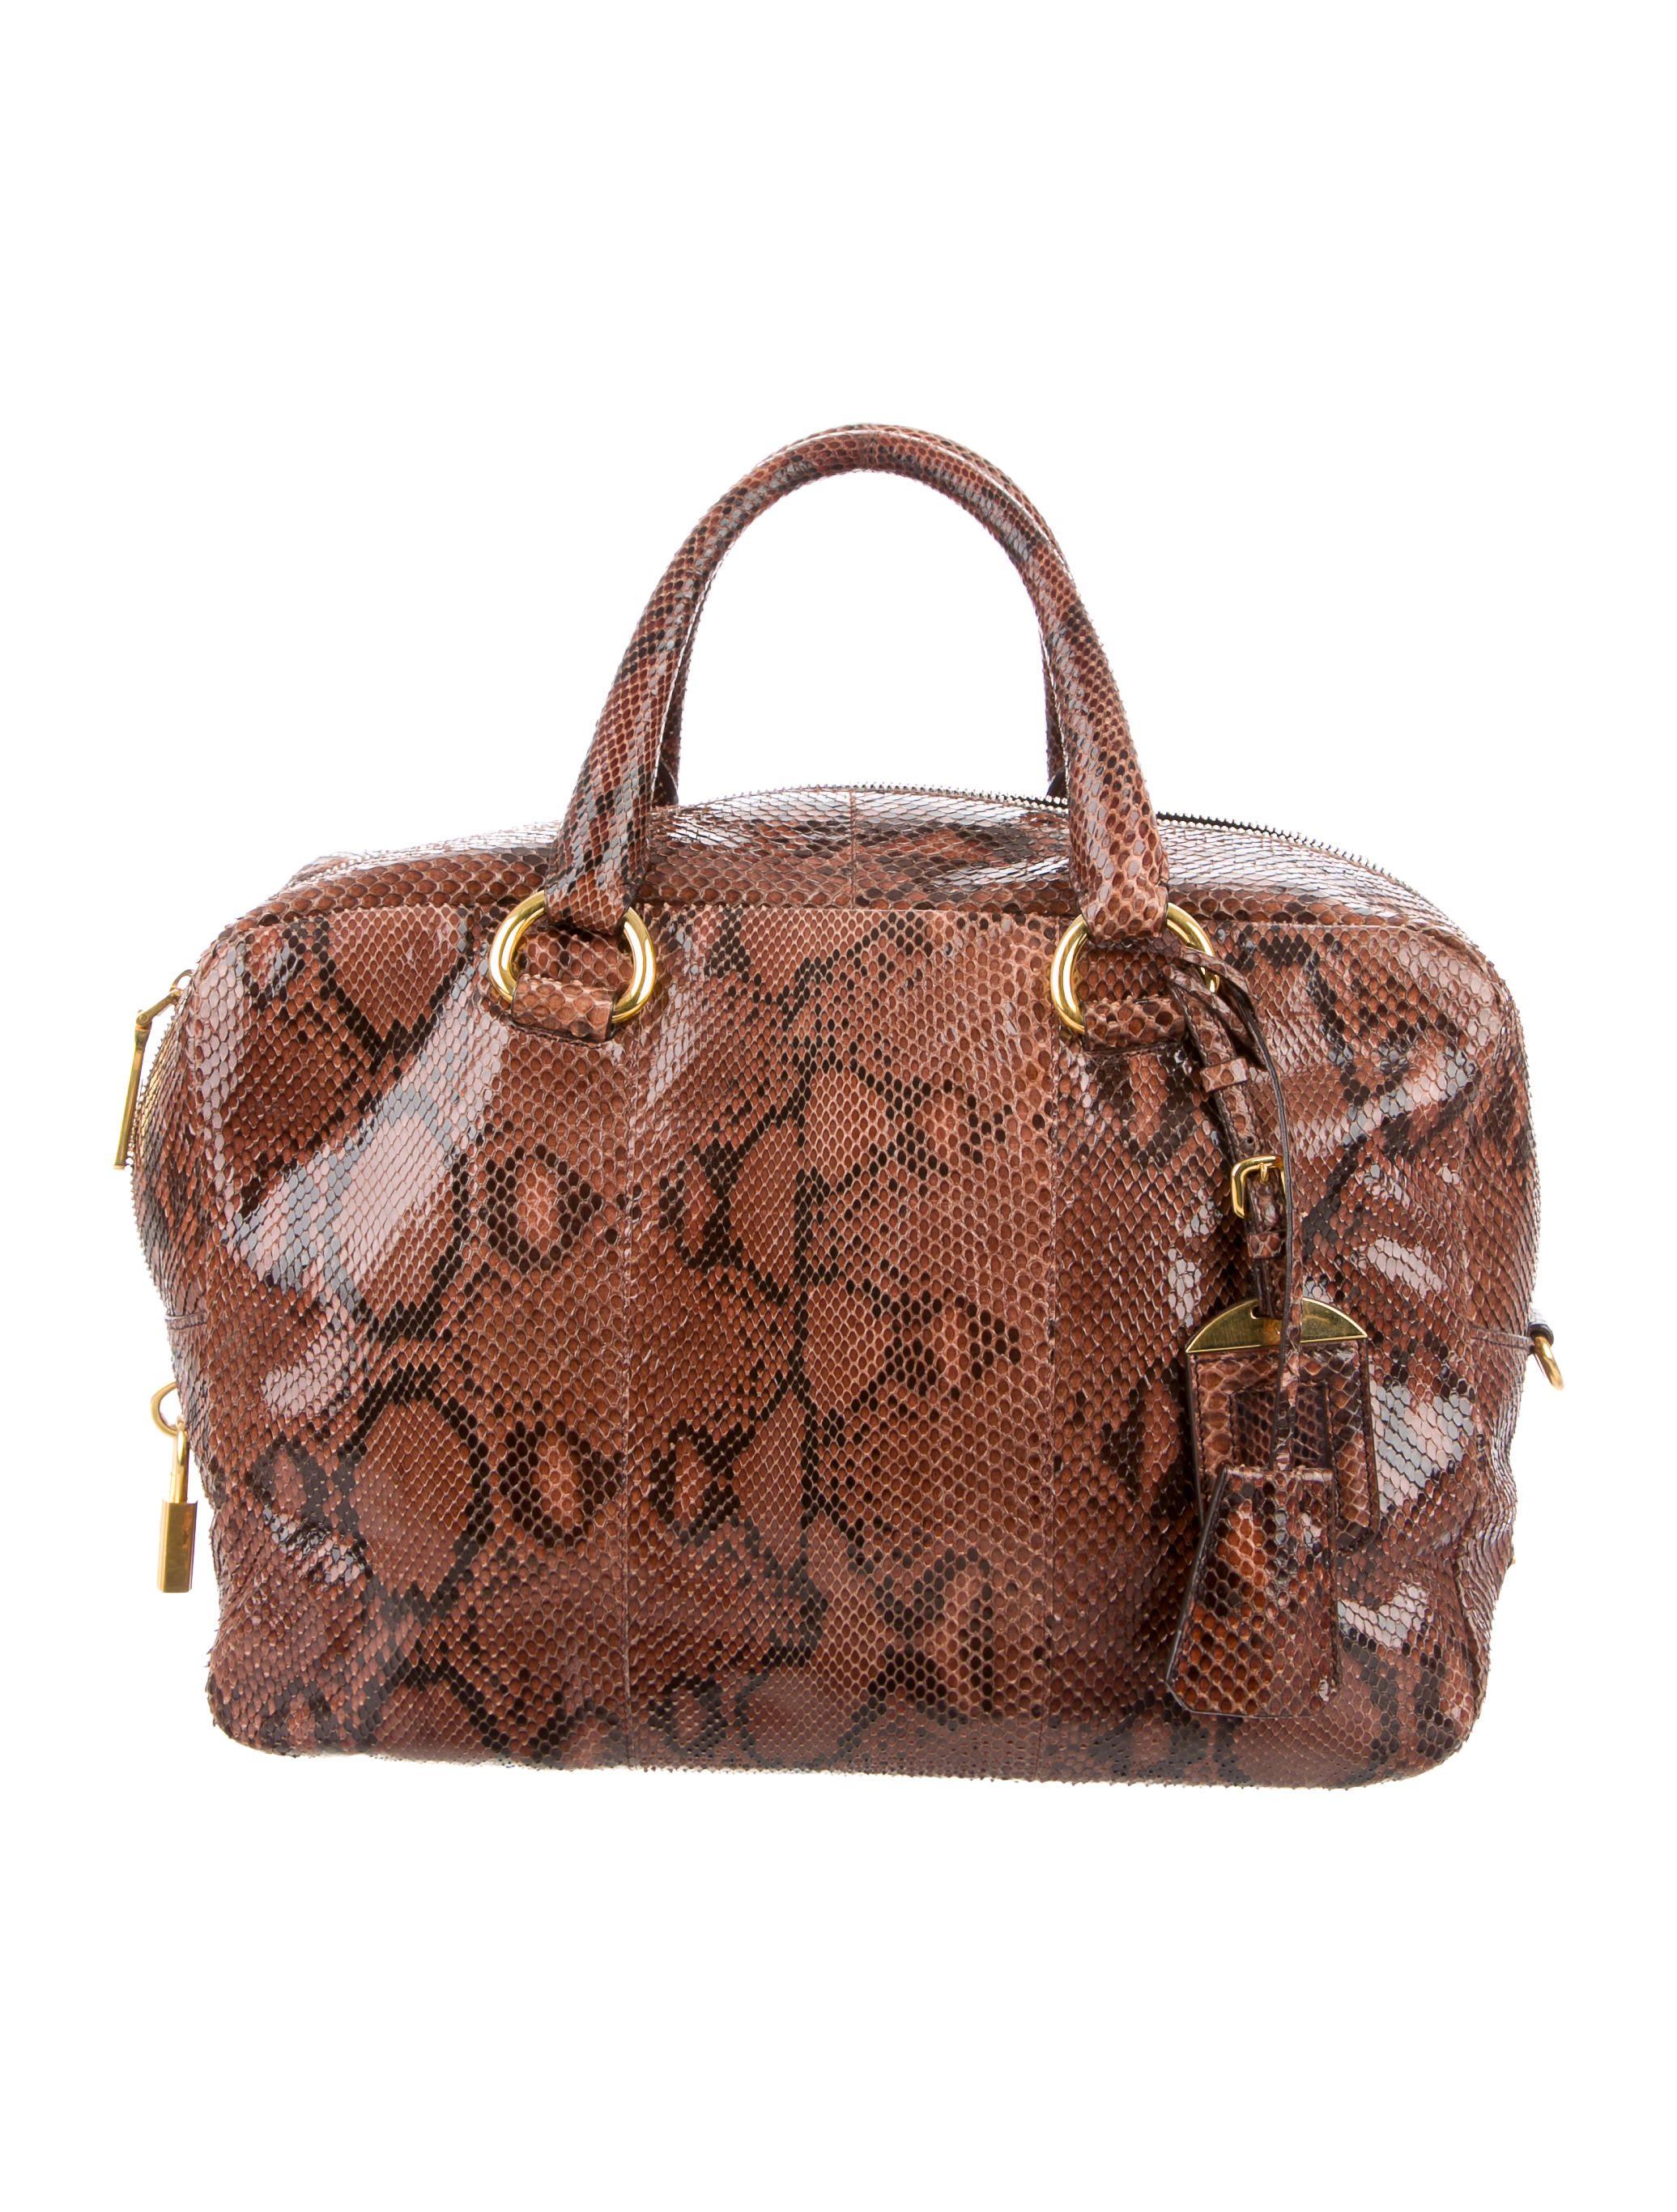 5f882929c278 Brown and black python Prada Bauletto bag with gold-tone hardware, logo  placard at